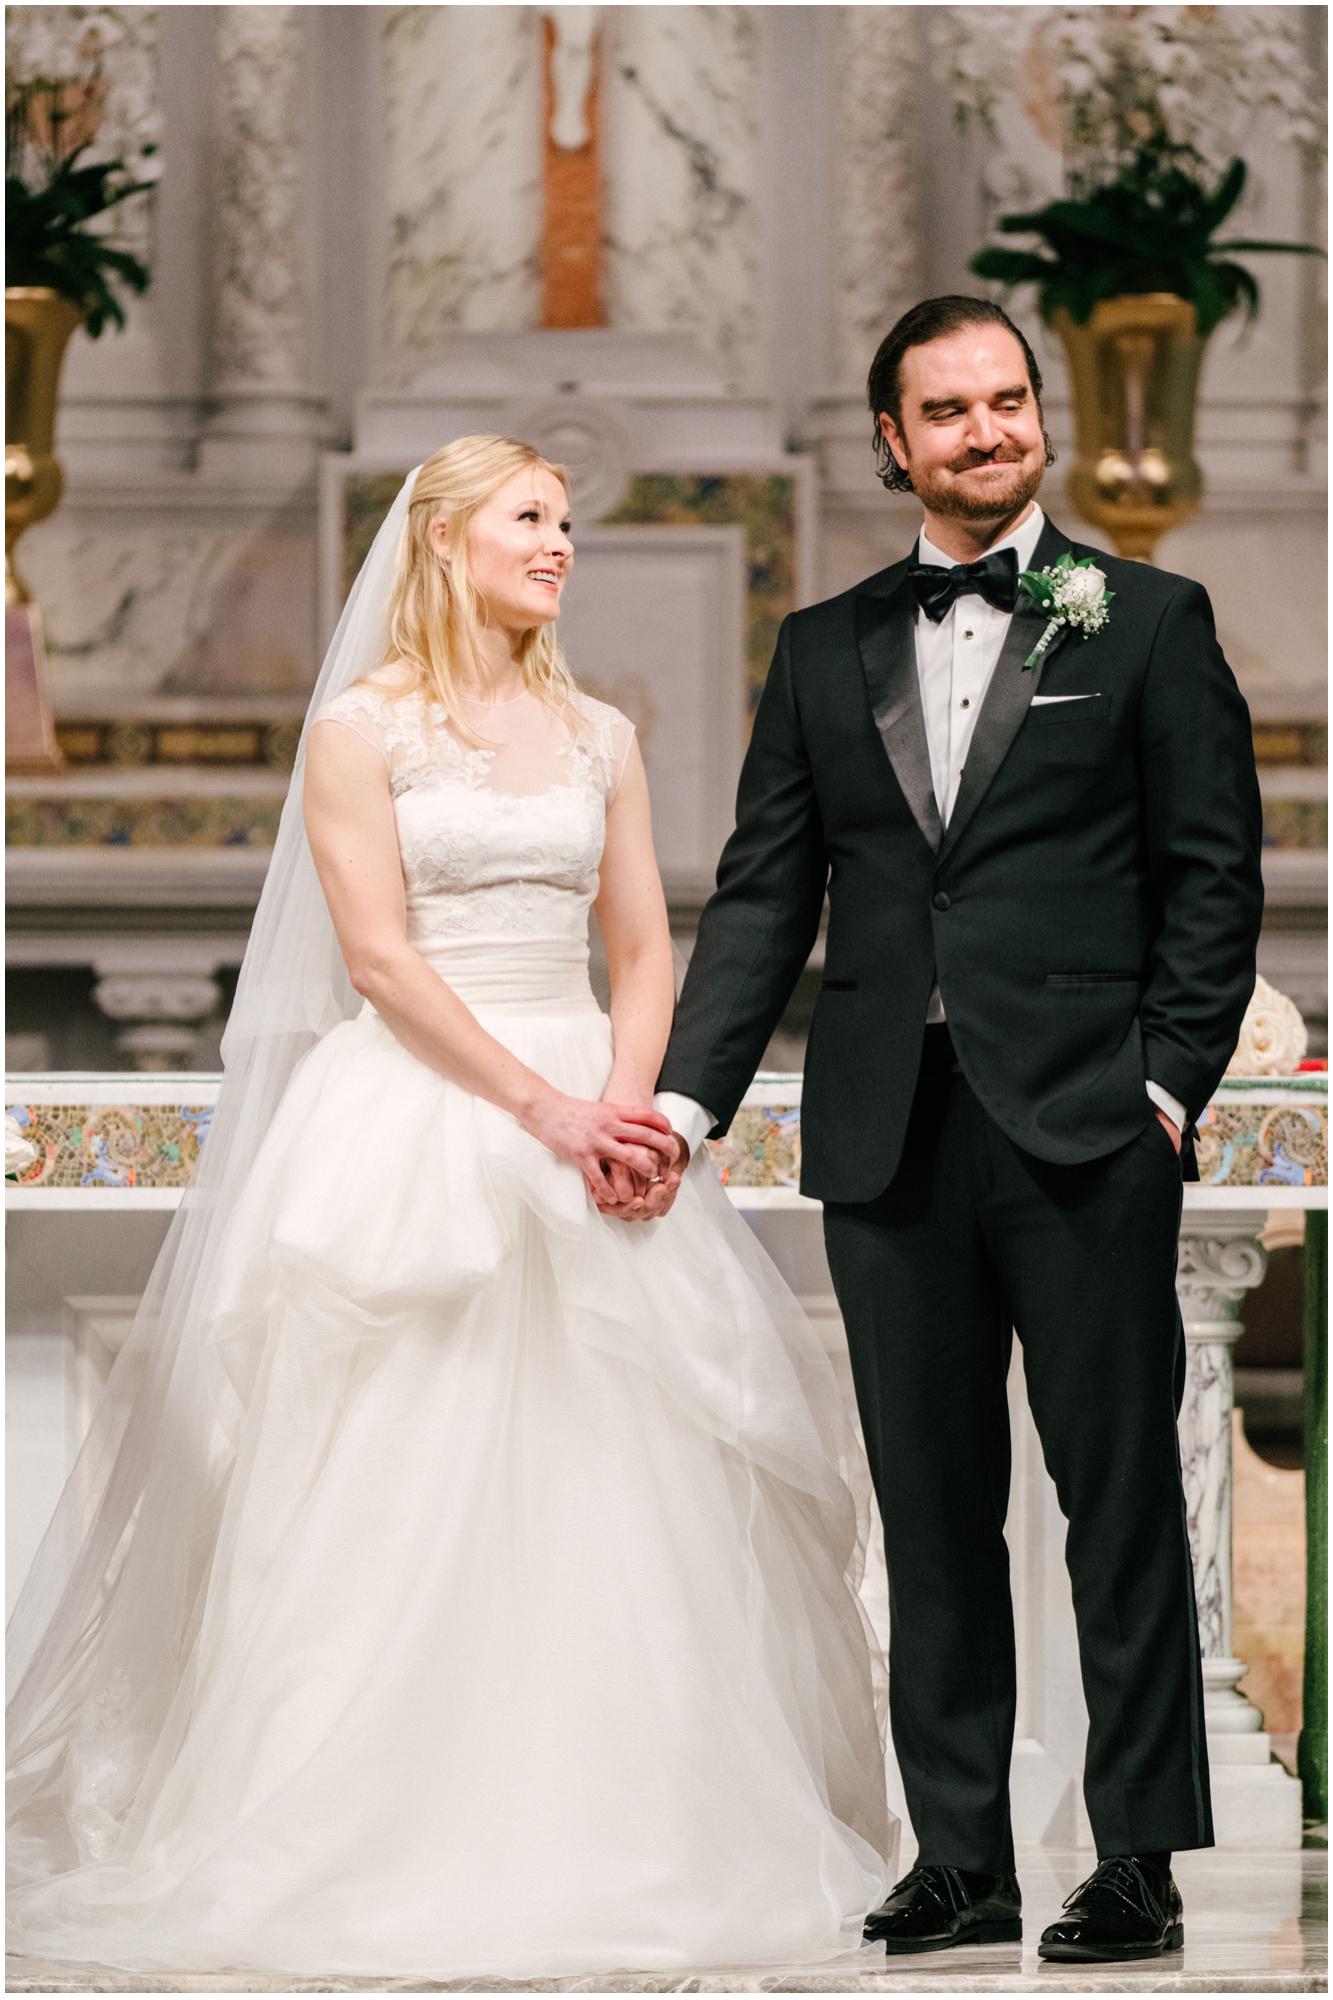 weddingplanningideas.jpg